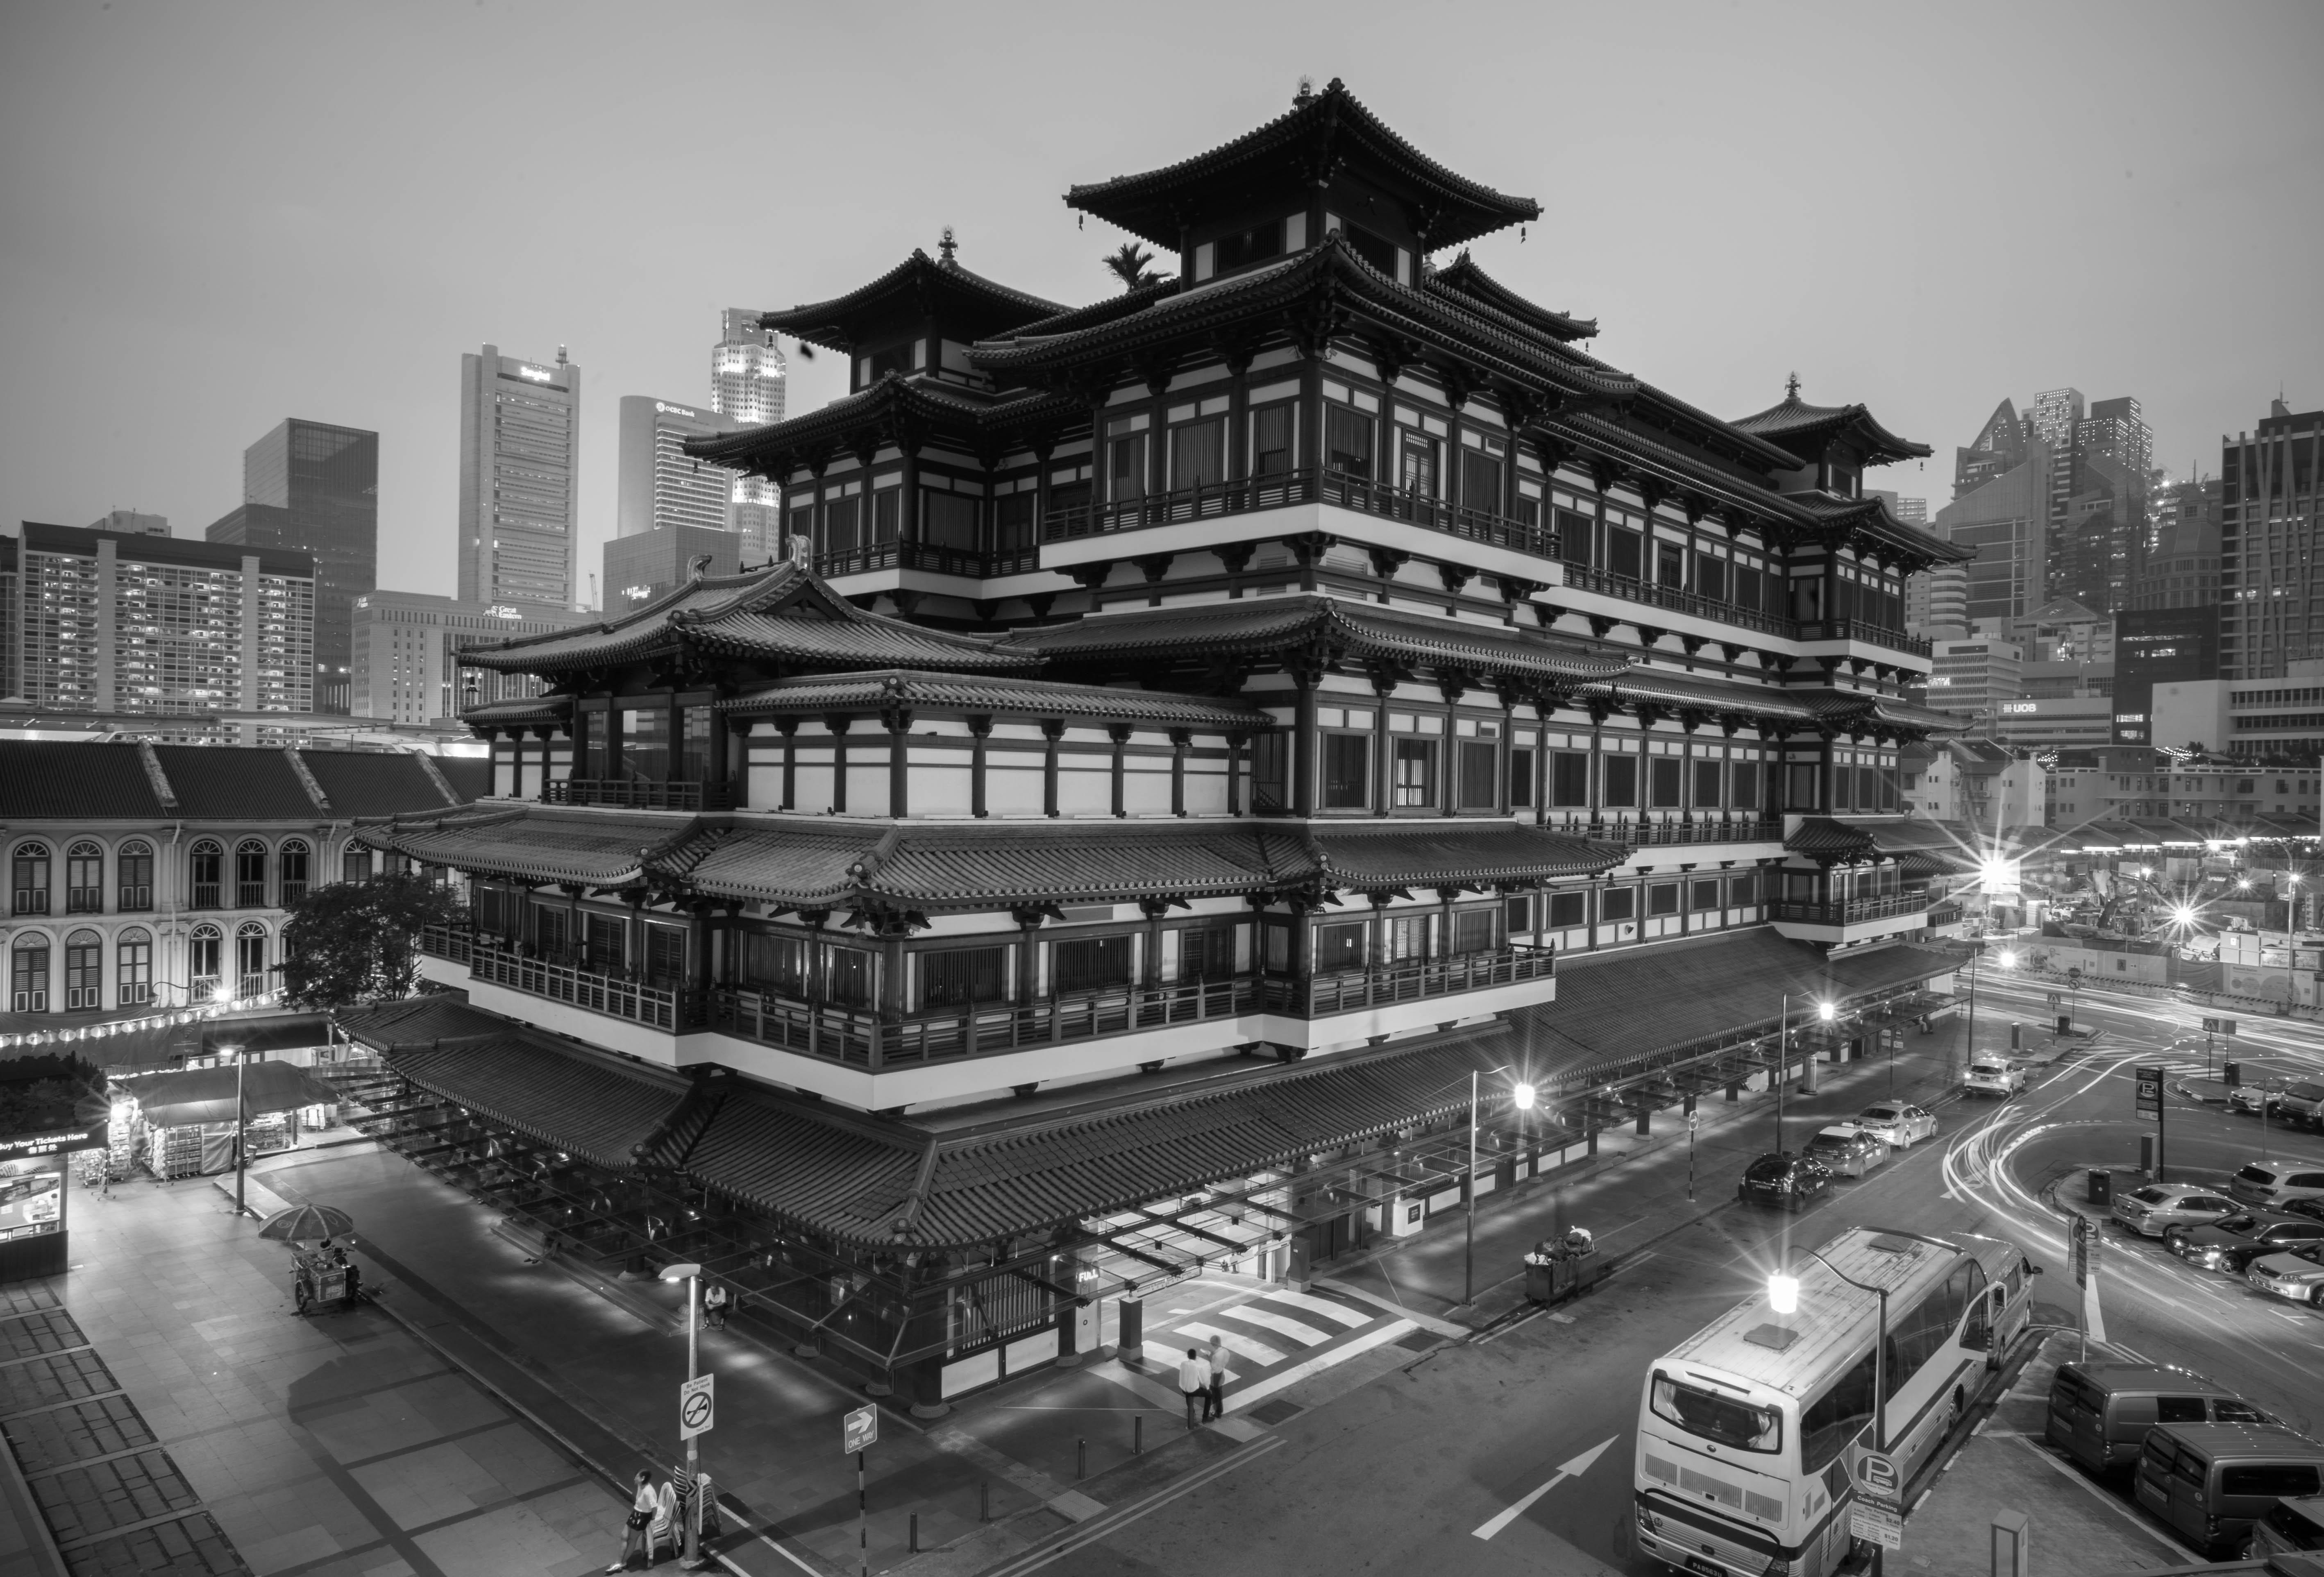 Frank gronau sony alpha7 singapur singapore schwarz weis black white china buddha tempel relic langzeit belichtung